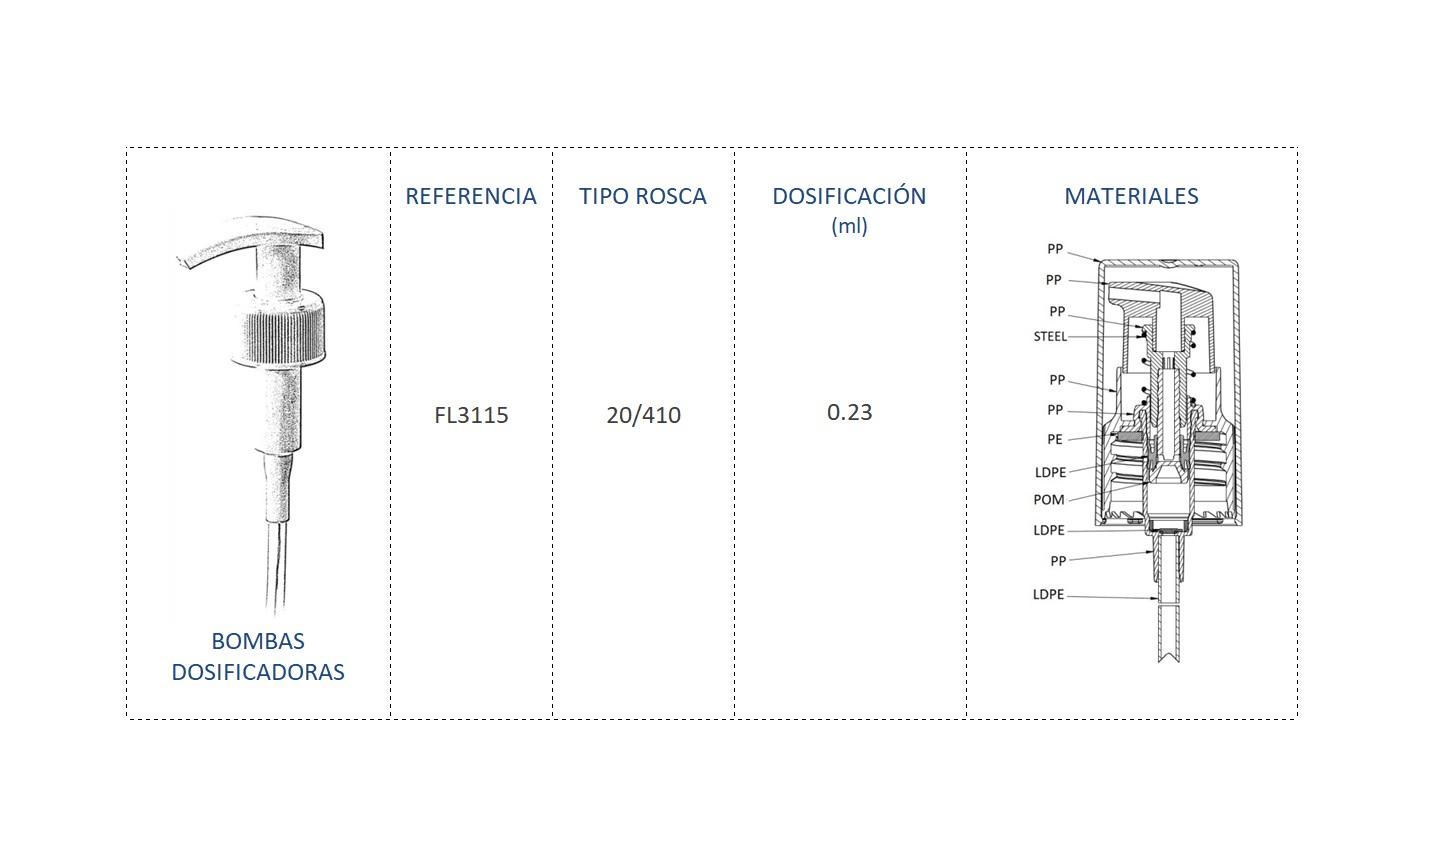 Cuadro de materiales bomba dosificadora FL3115 20/410